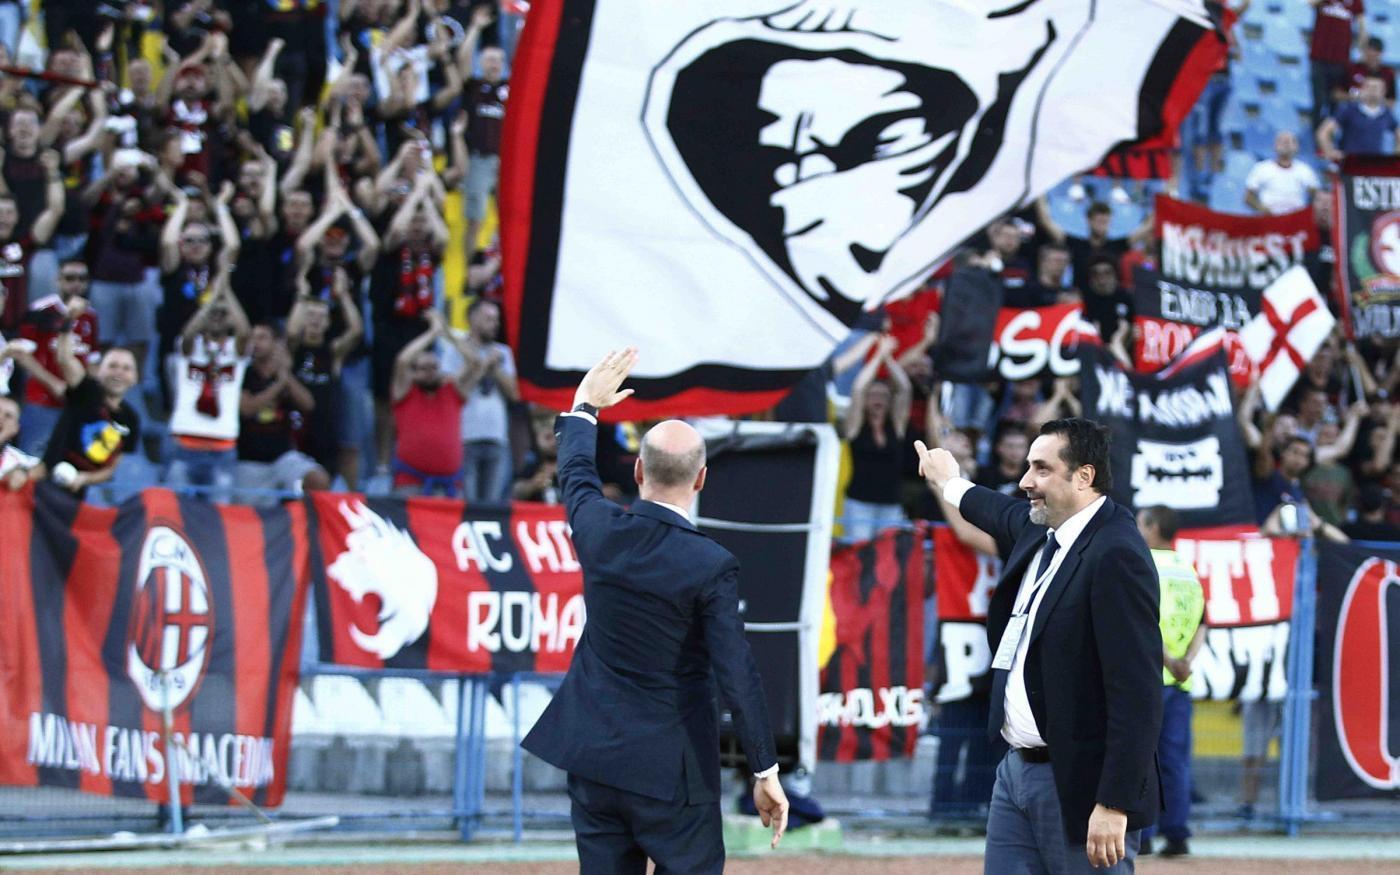 E. League: Rodriguez-gol, il Milan vede i playoff